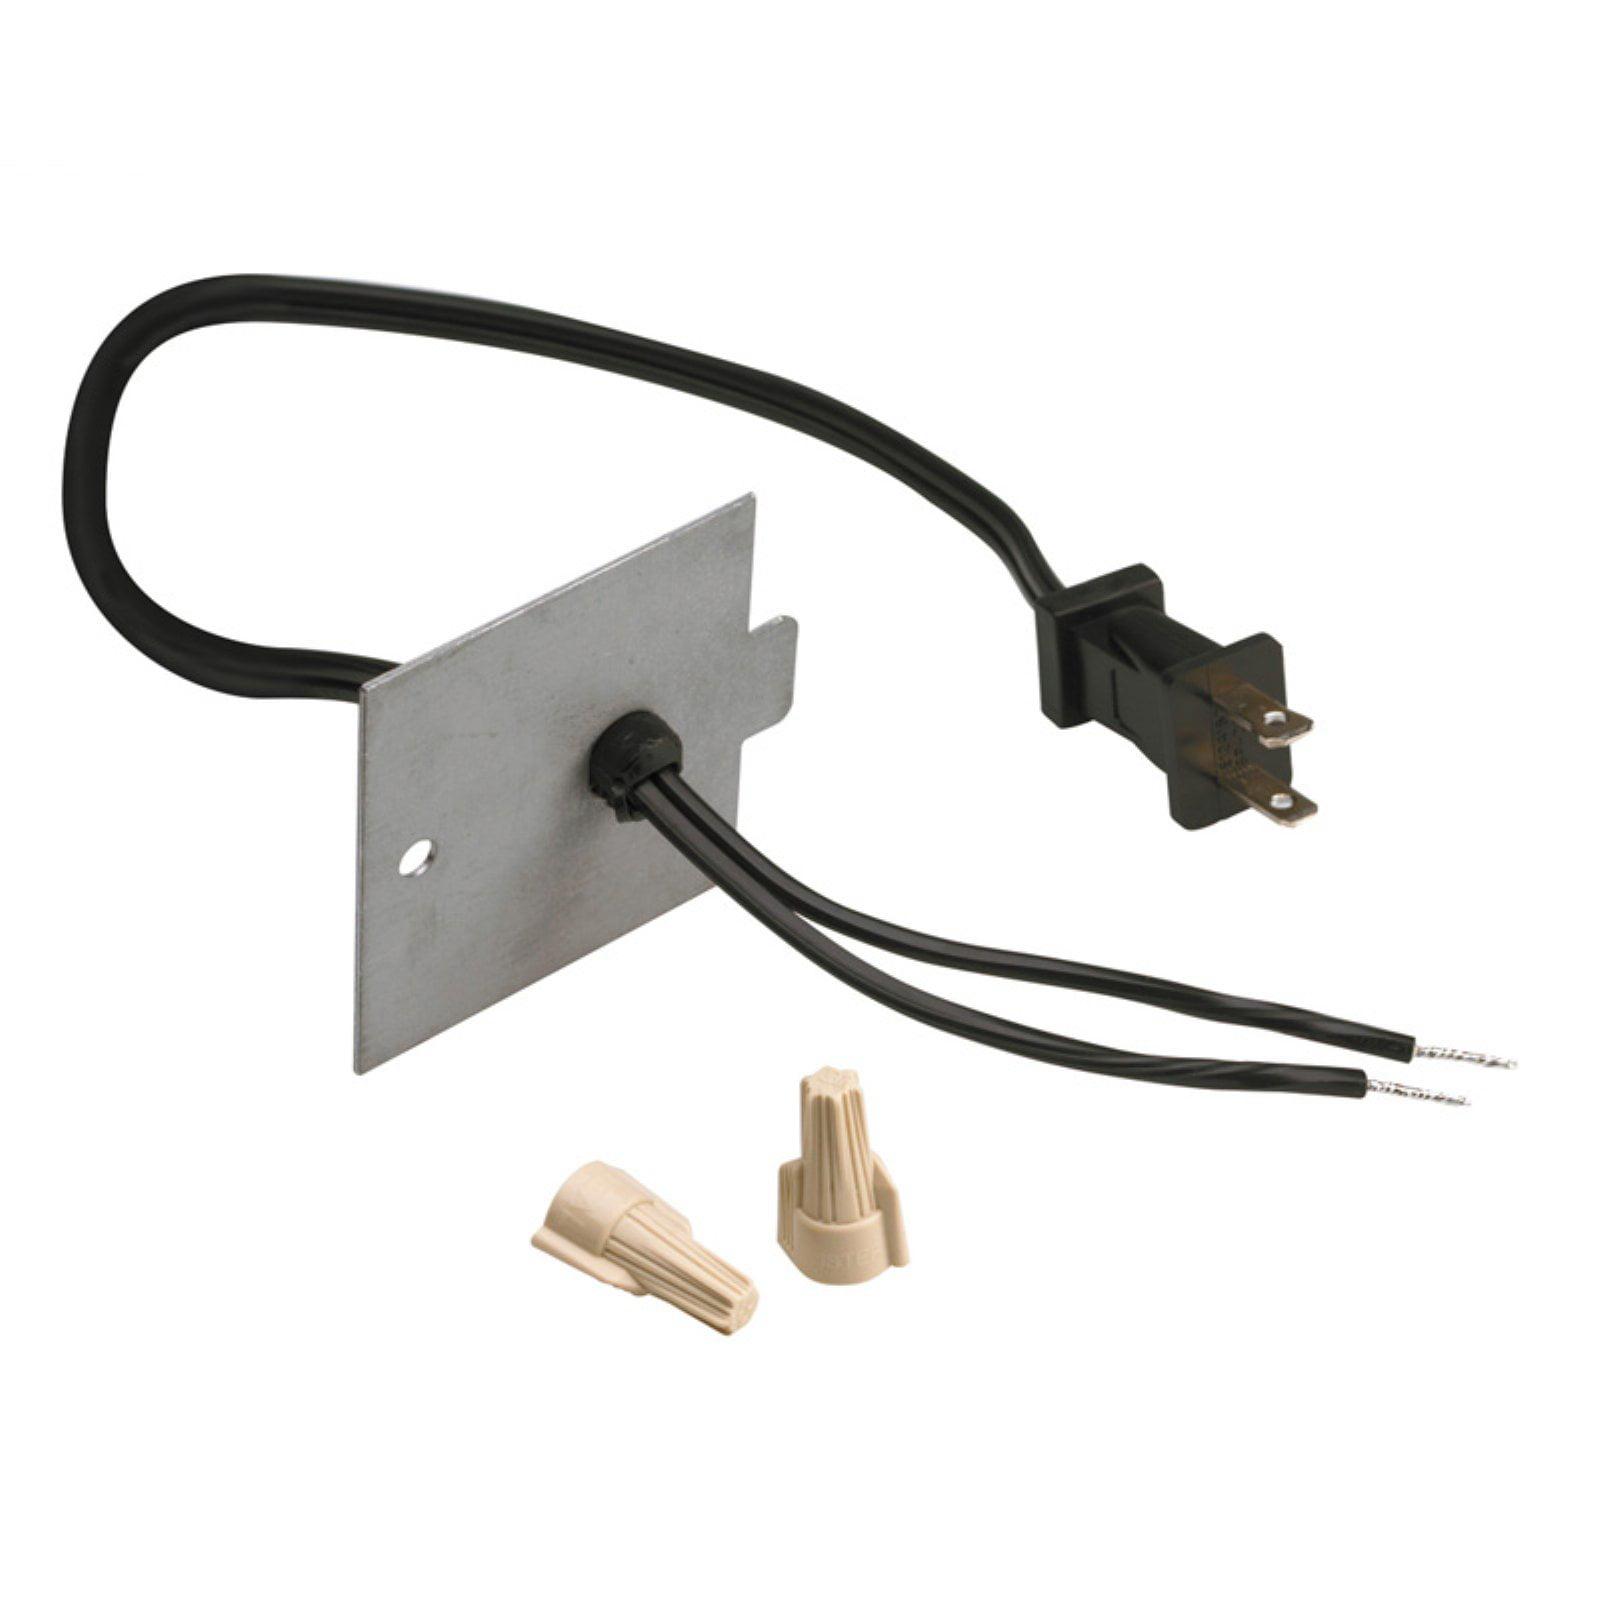 Dimplex Accessories Kit for 120V Firebox